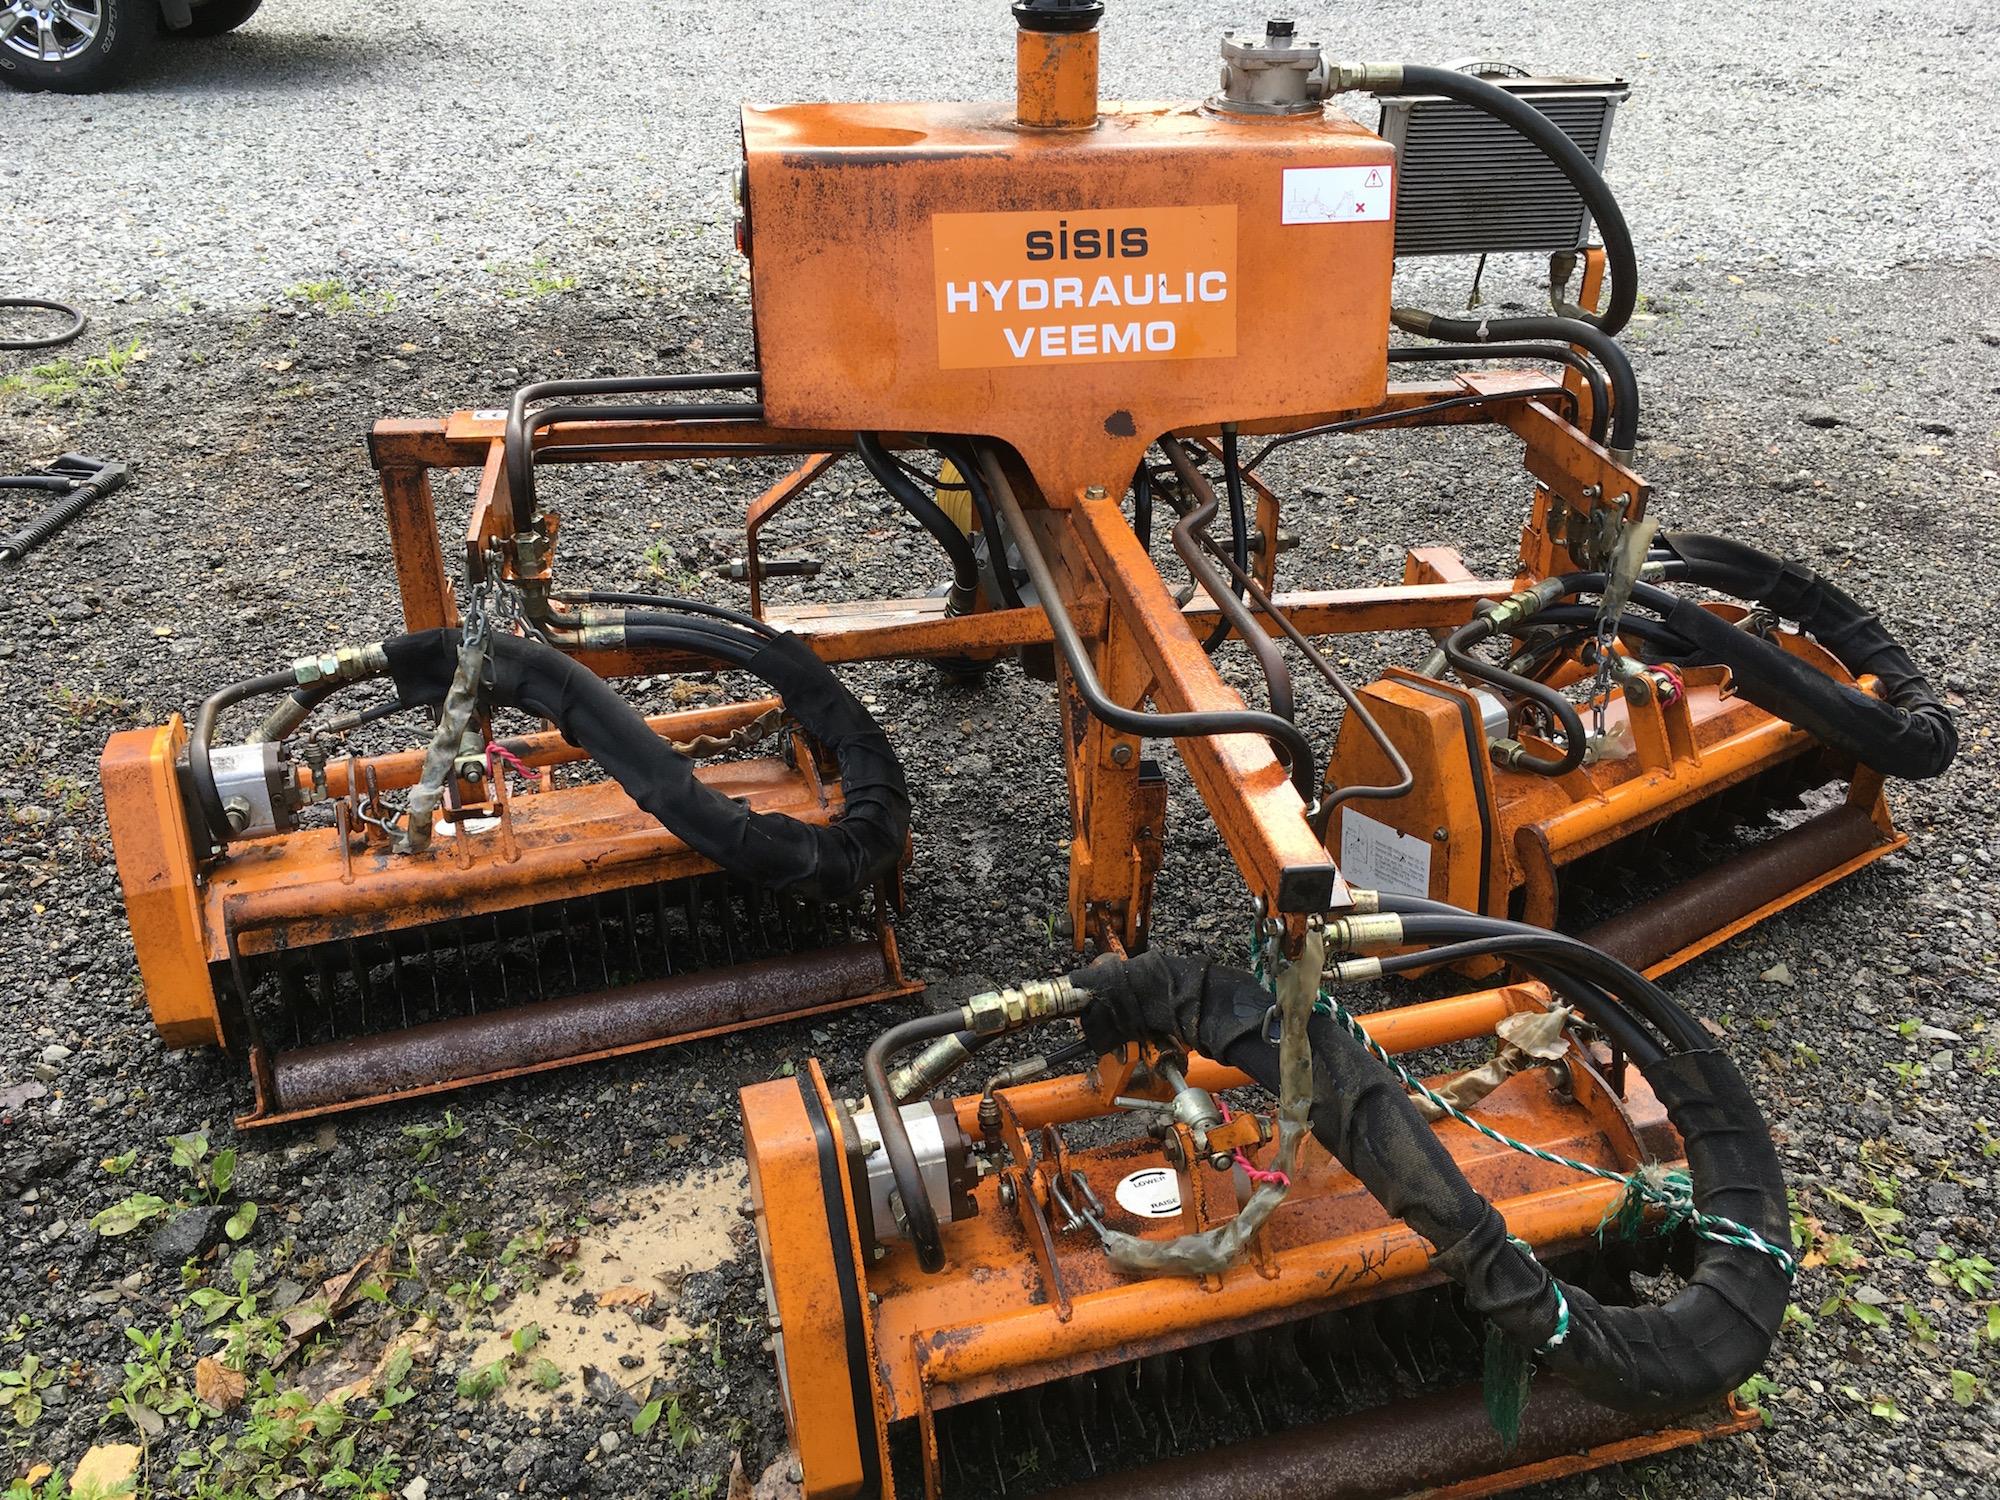 Sisis-Hydraulic-Veemo-Verticutter-01